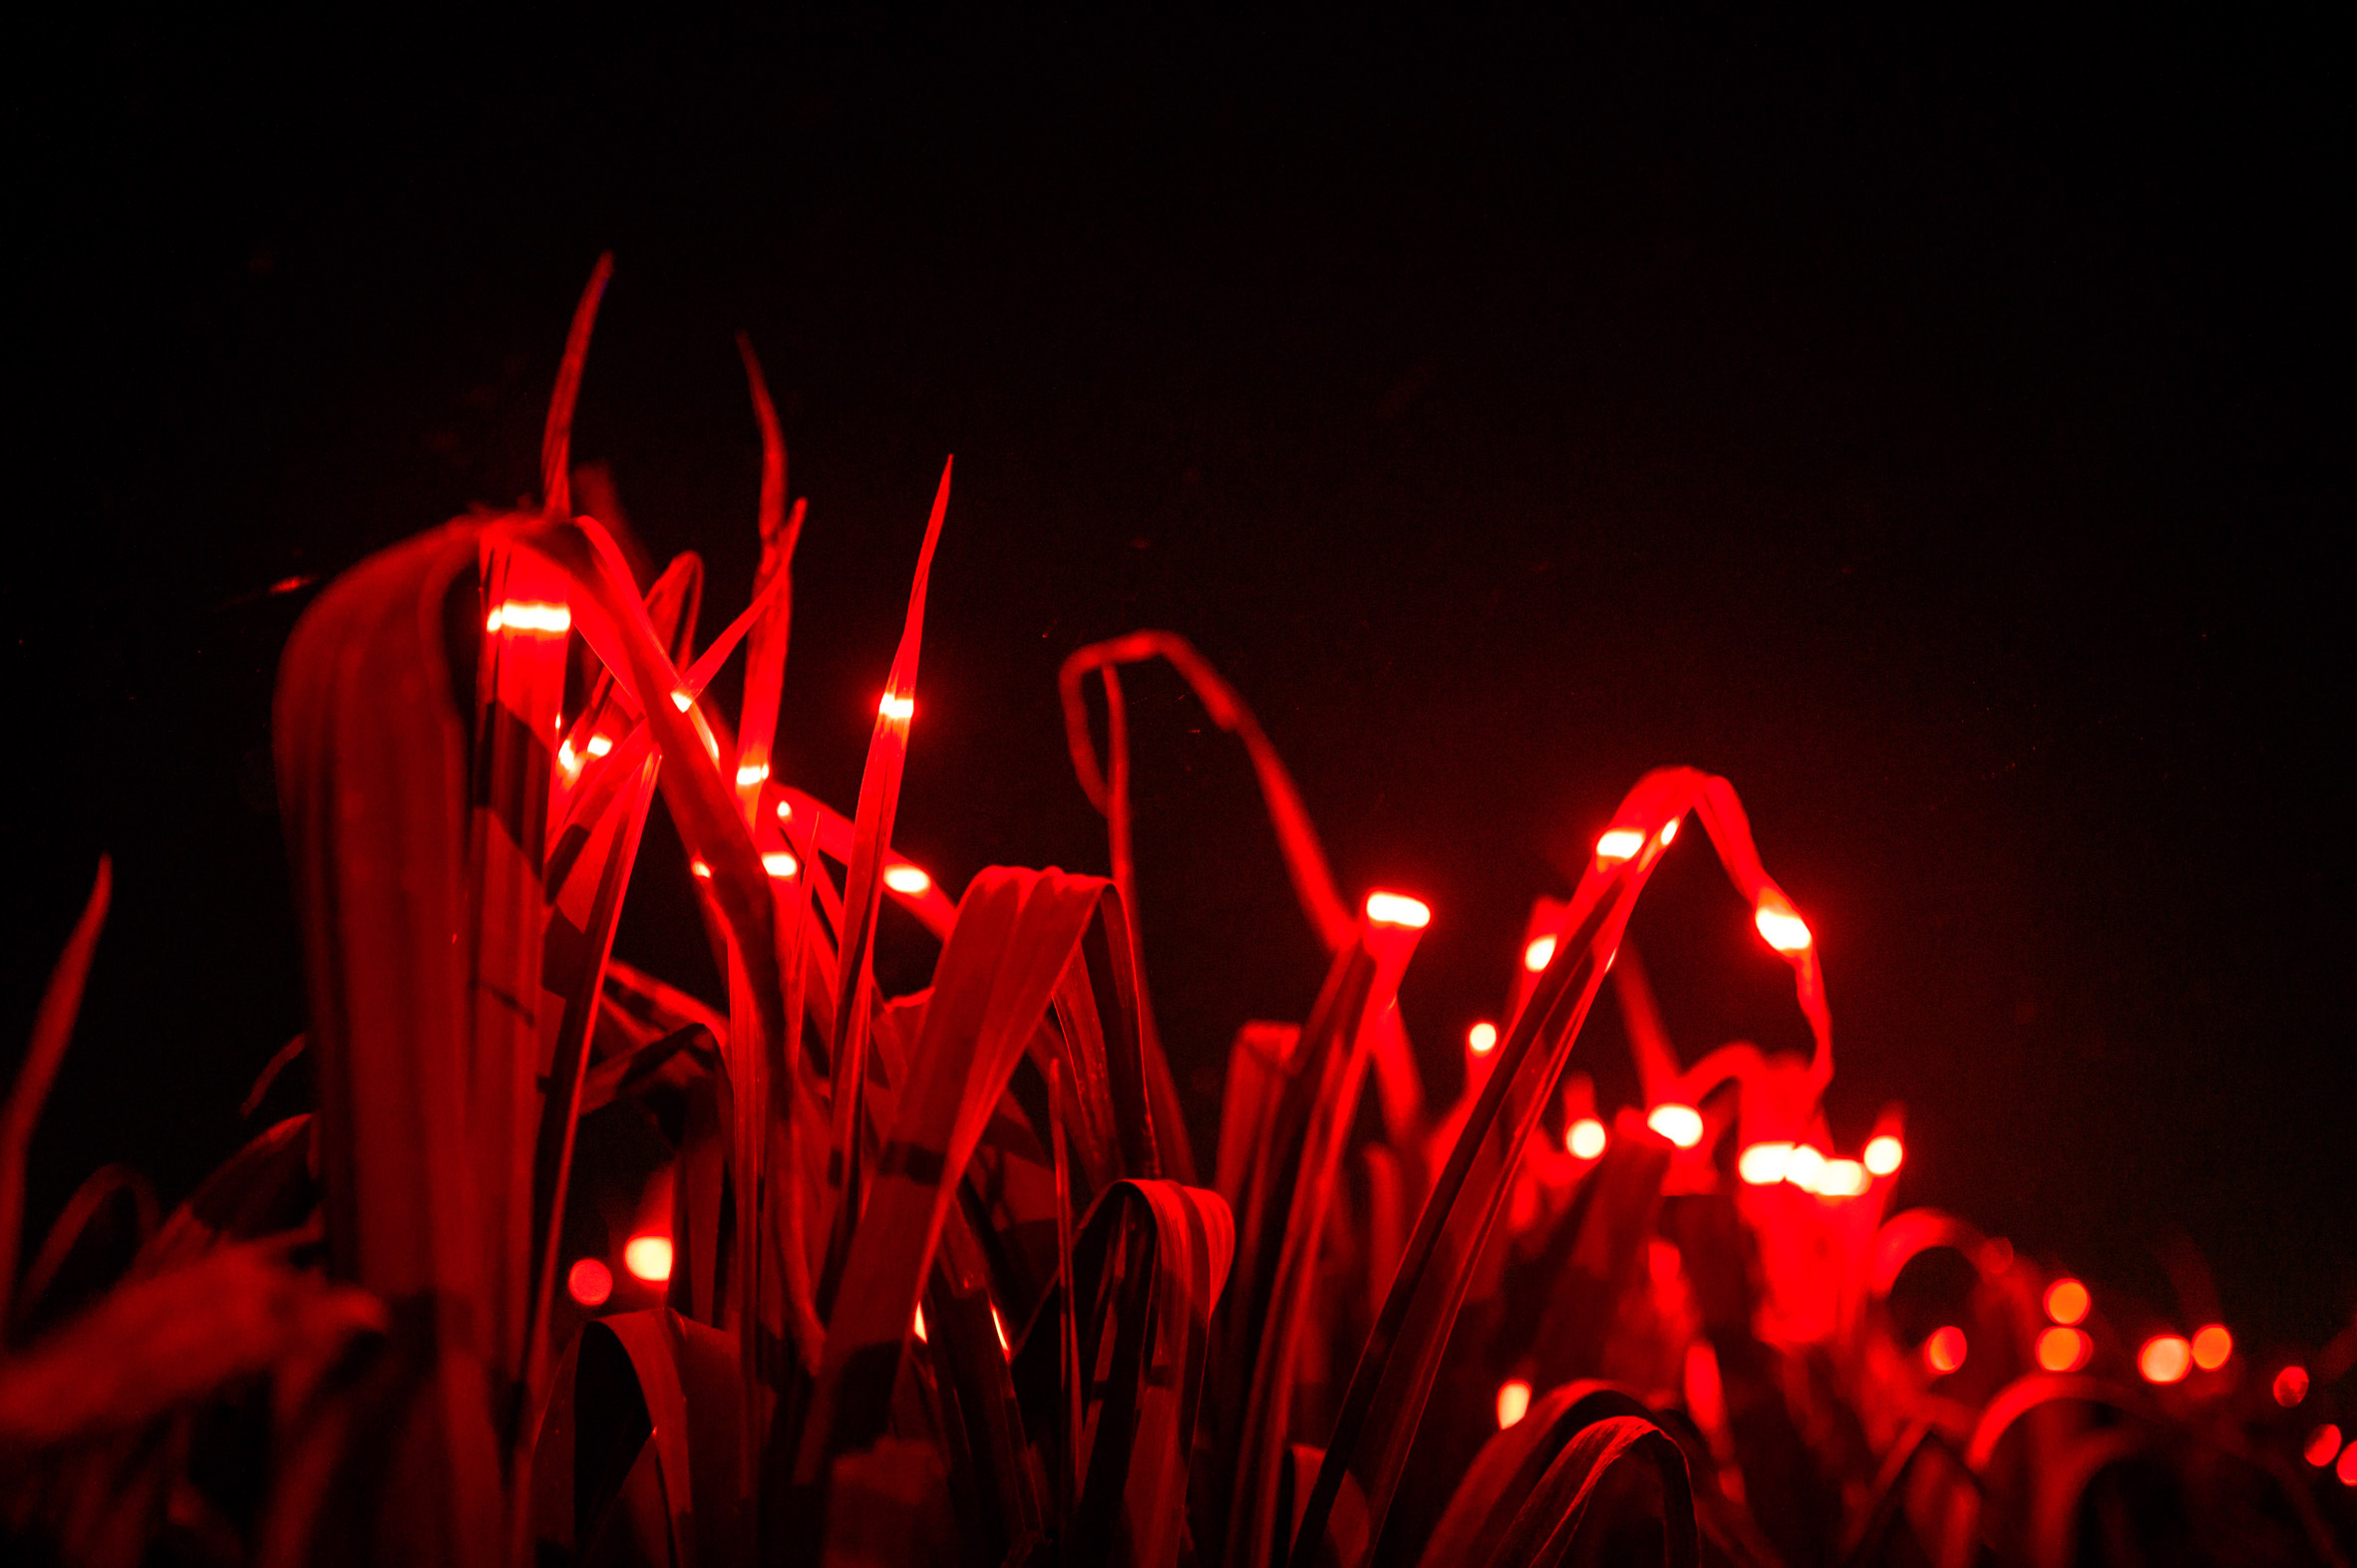 Red light in Grow installation by Studio Roosegaarde